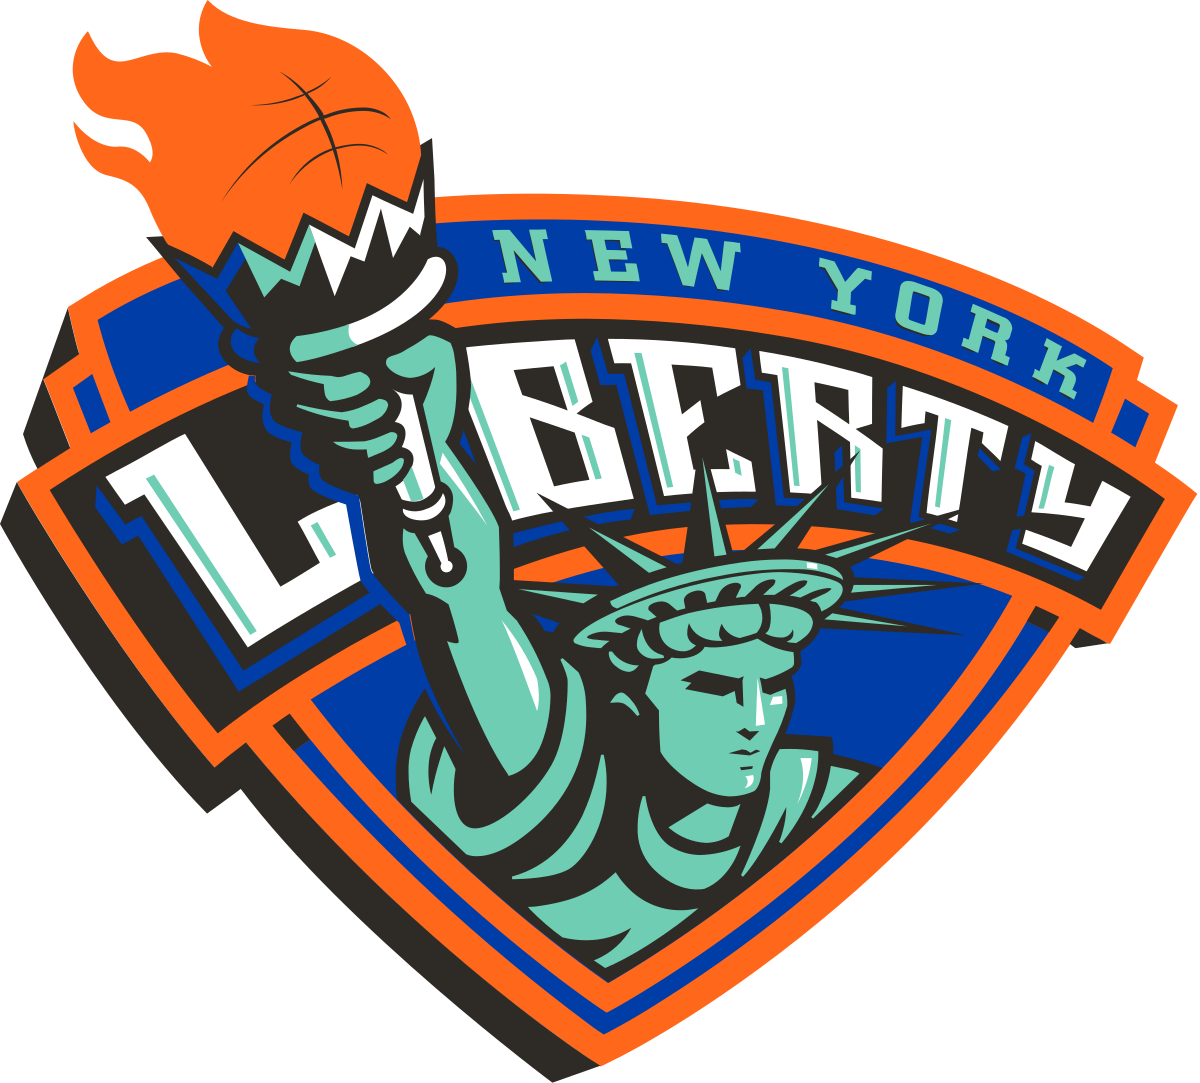 New york wikipedia . Patriots clipart liberty